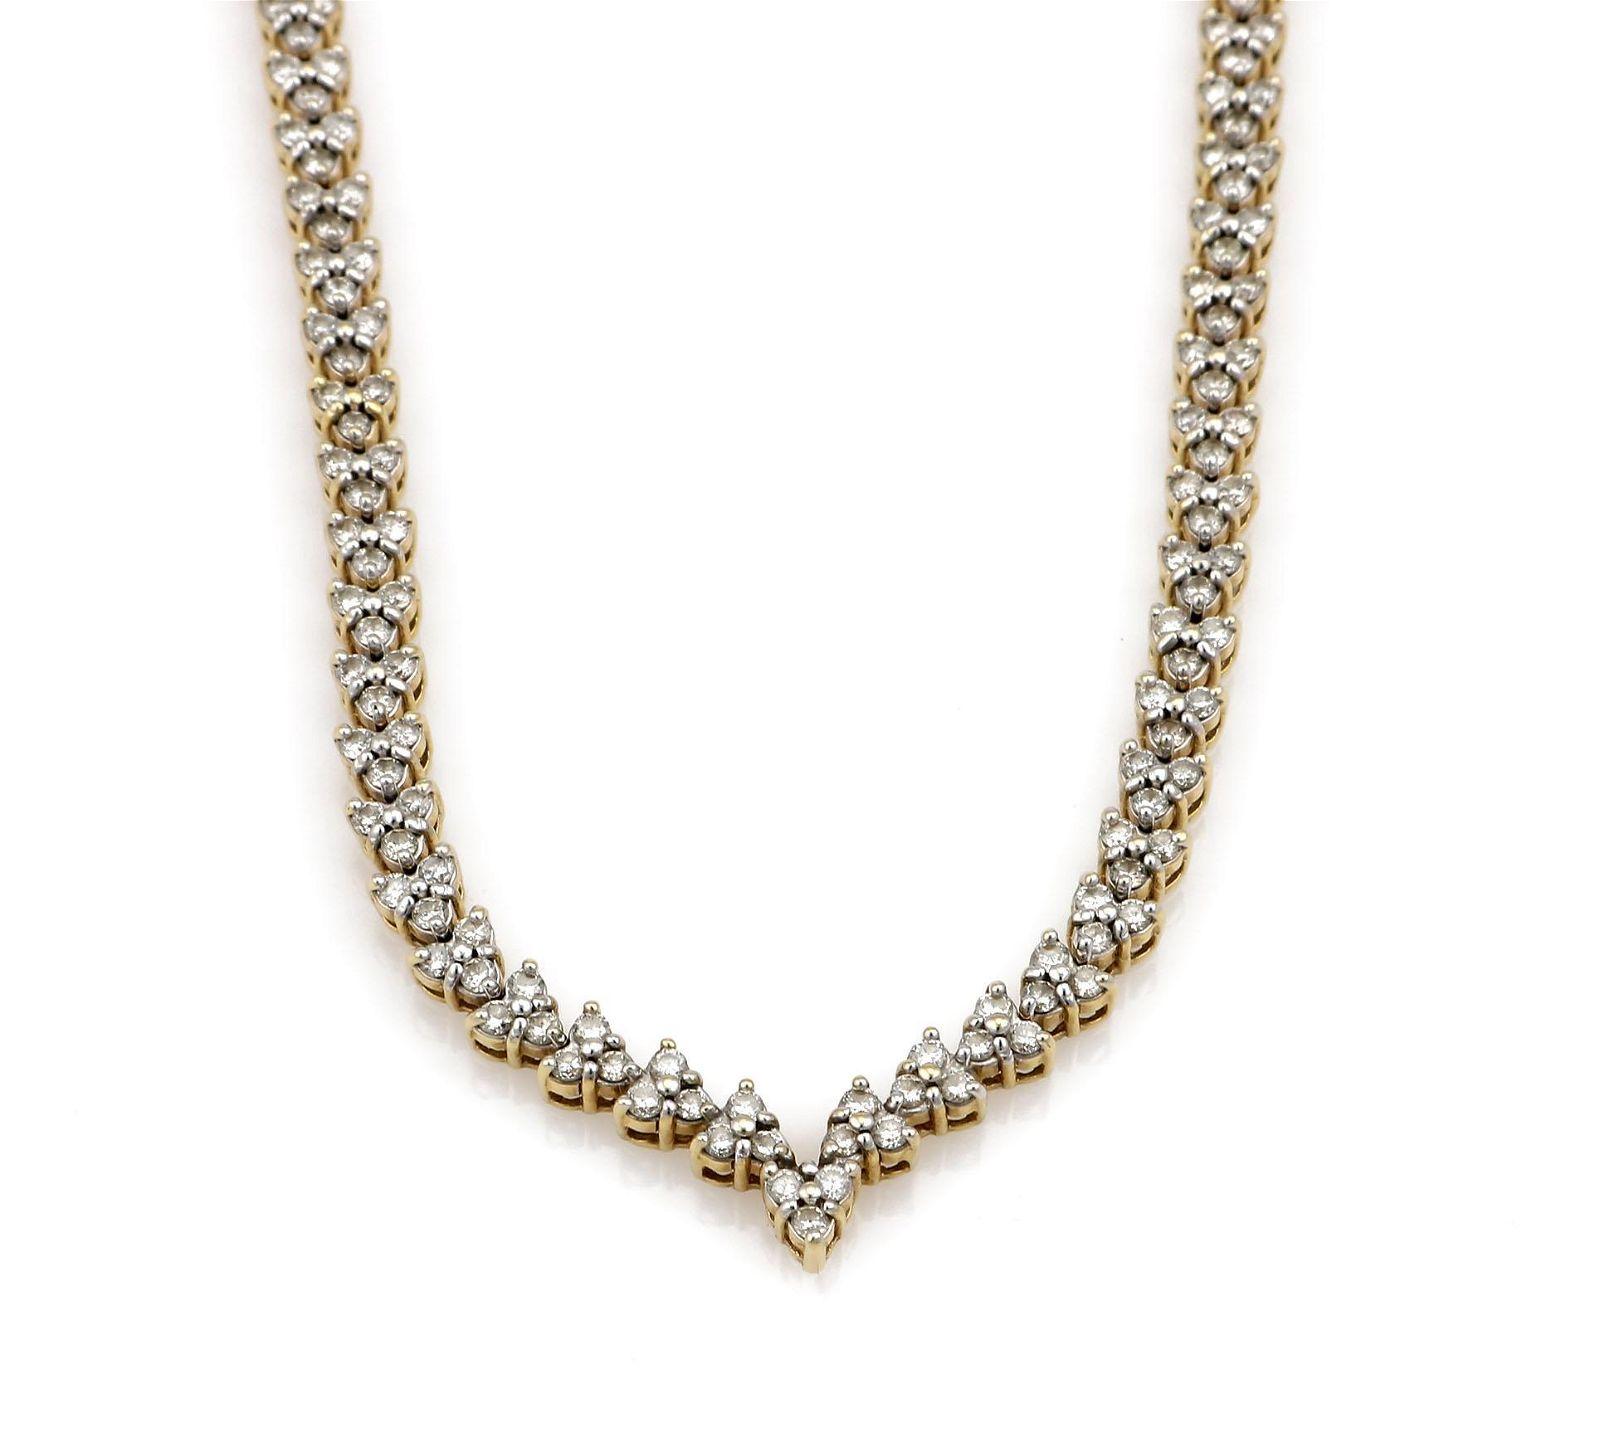 14K Yellow Gold 7.29ct Diamond Heart Necklace